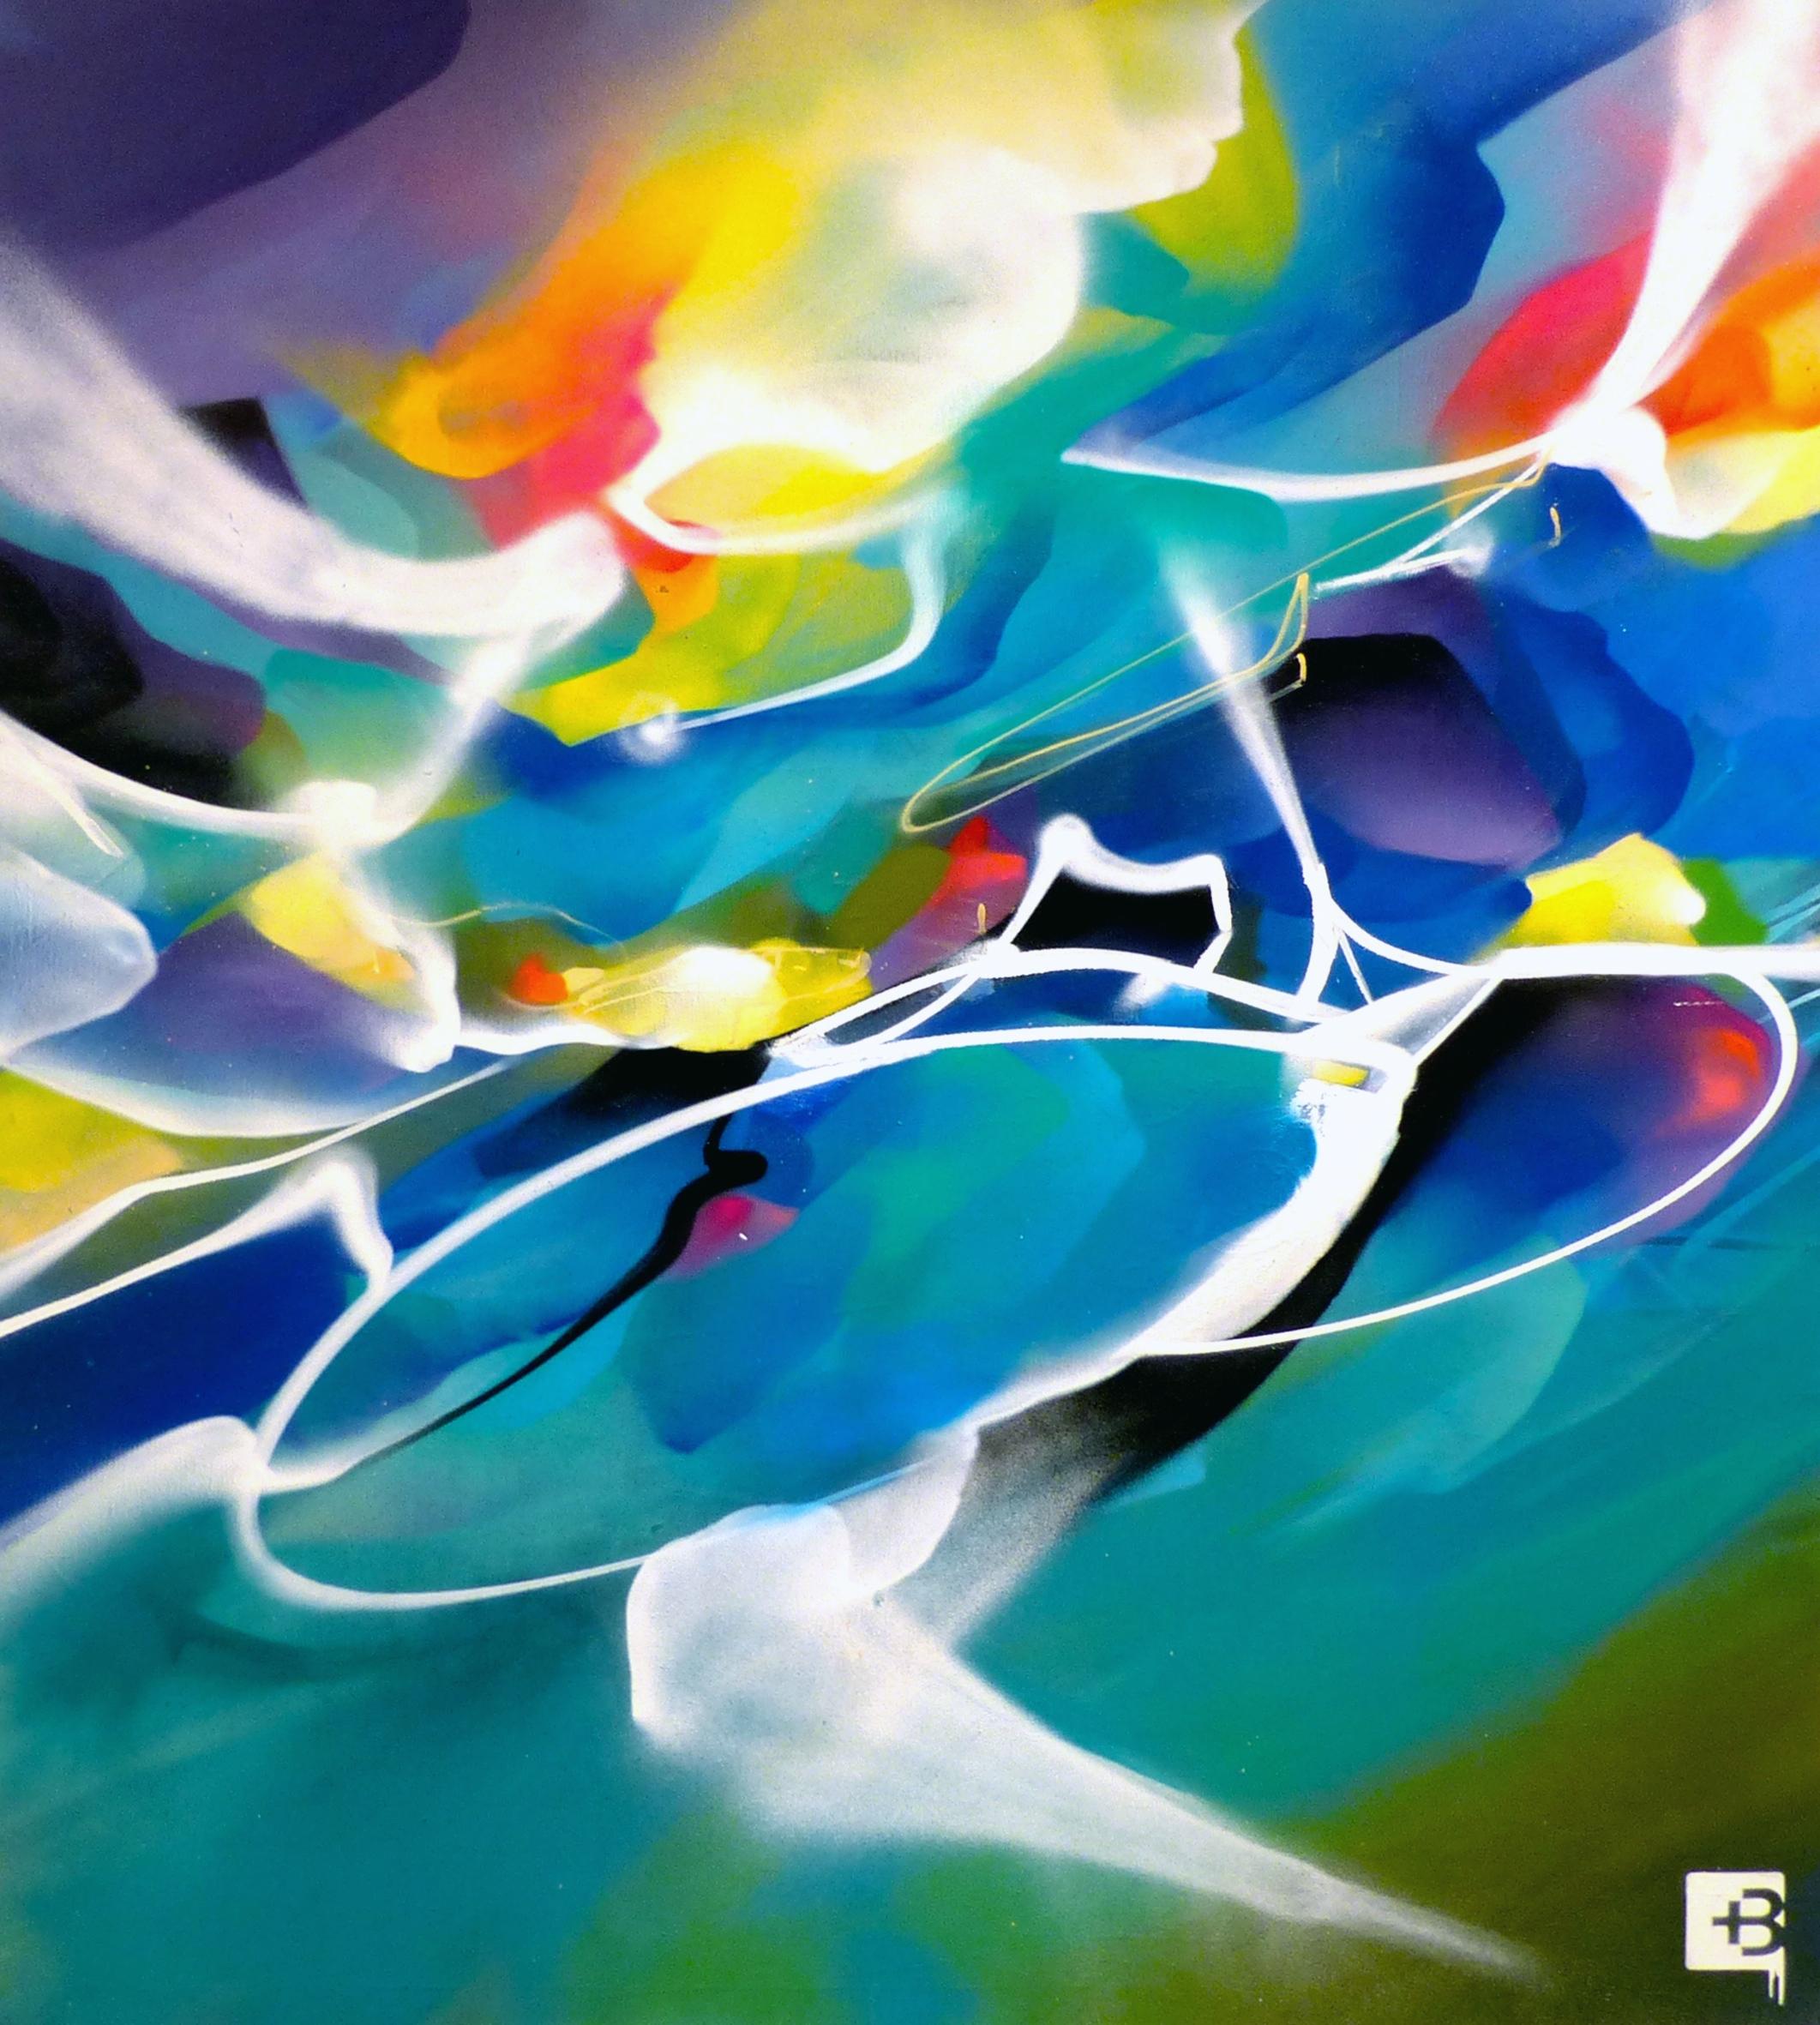 art abstrait contemporain abstract graffiti nadib bandi peintures sur toiles. Black Bedroom Furniture Sets. Home Design Ideas